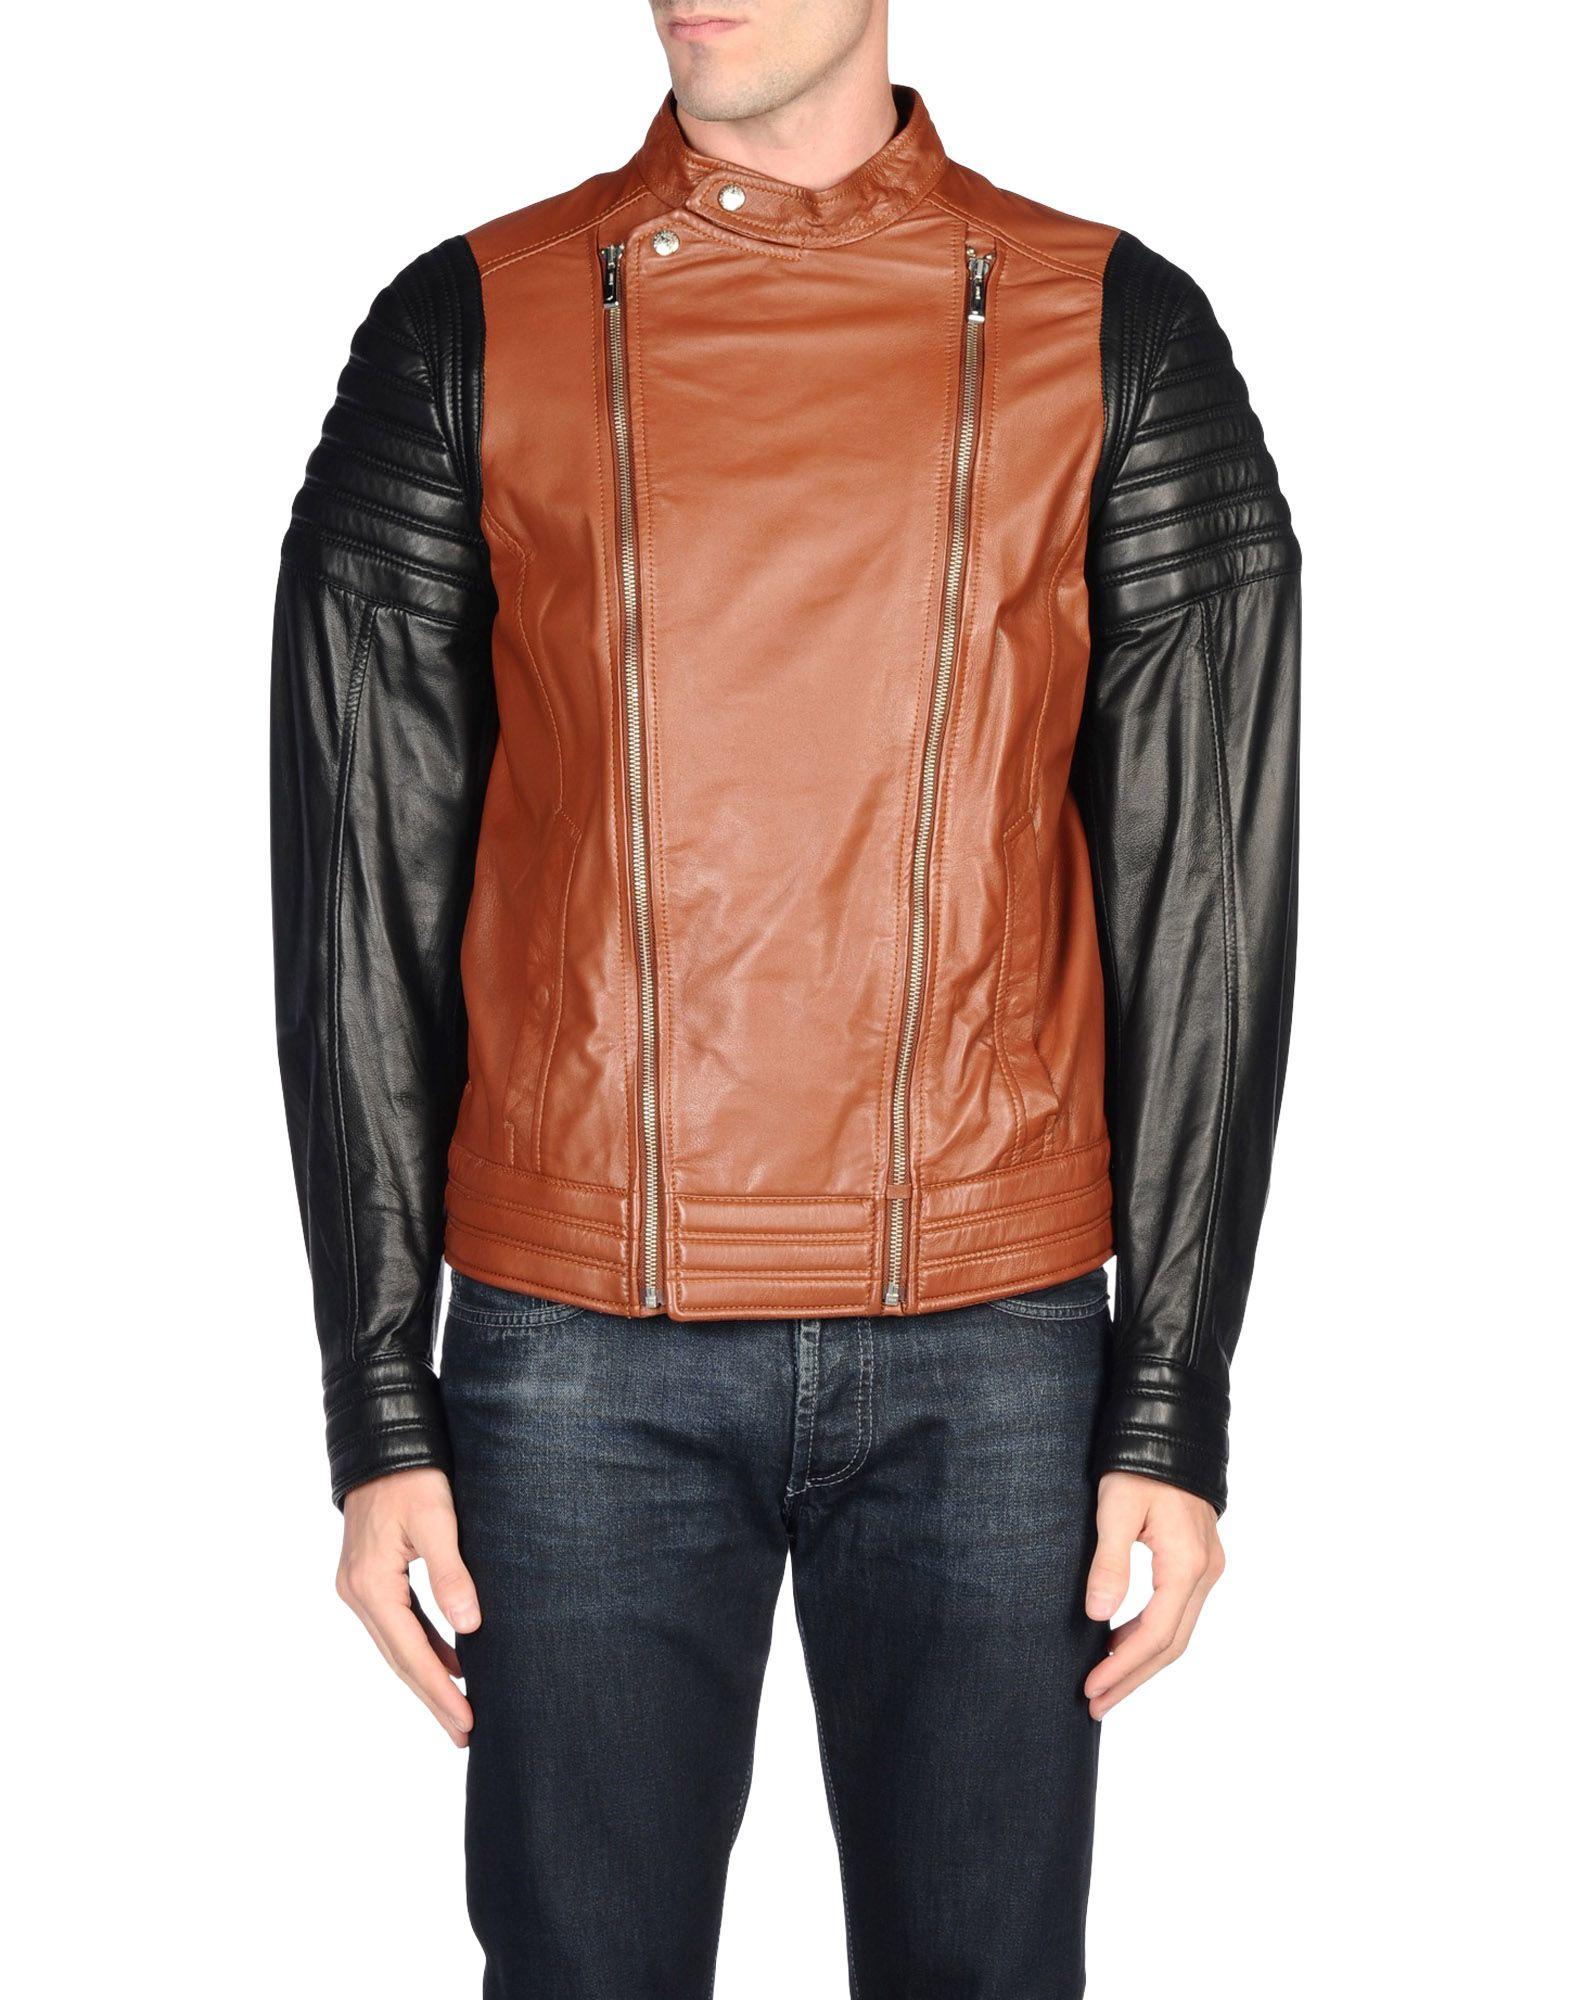 Just Cavalli Jacket In Brown For Men Lyst